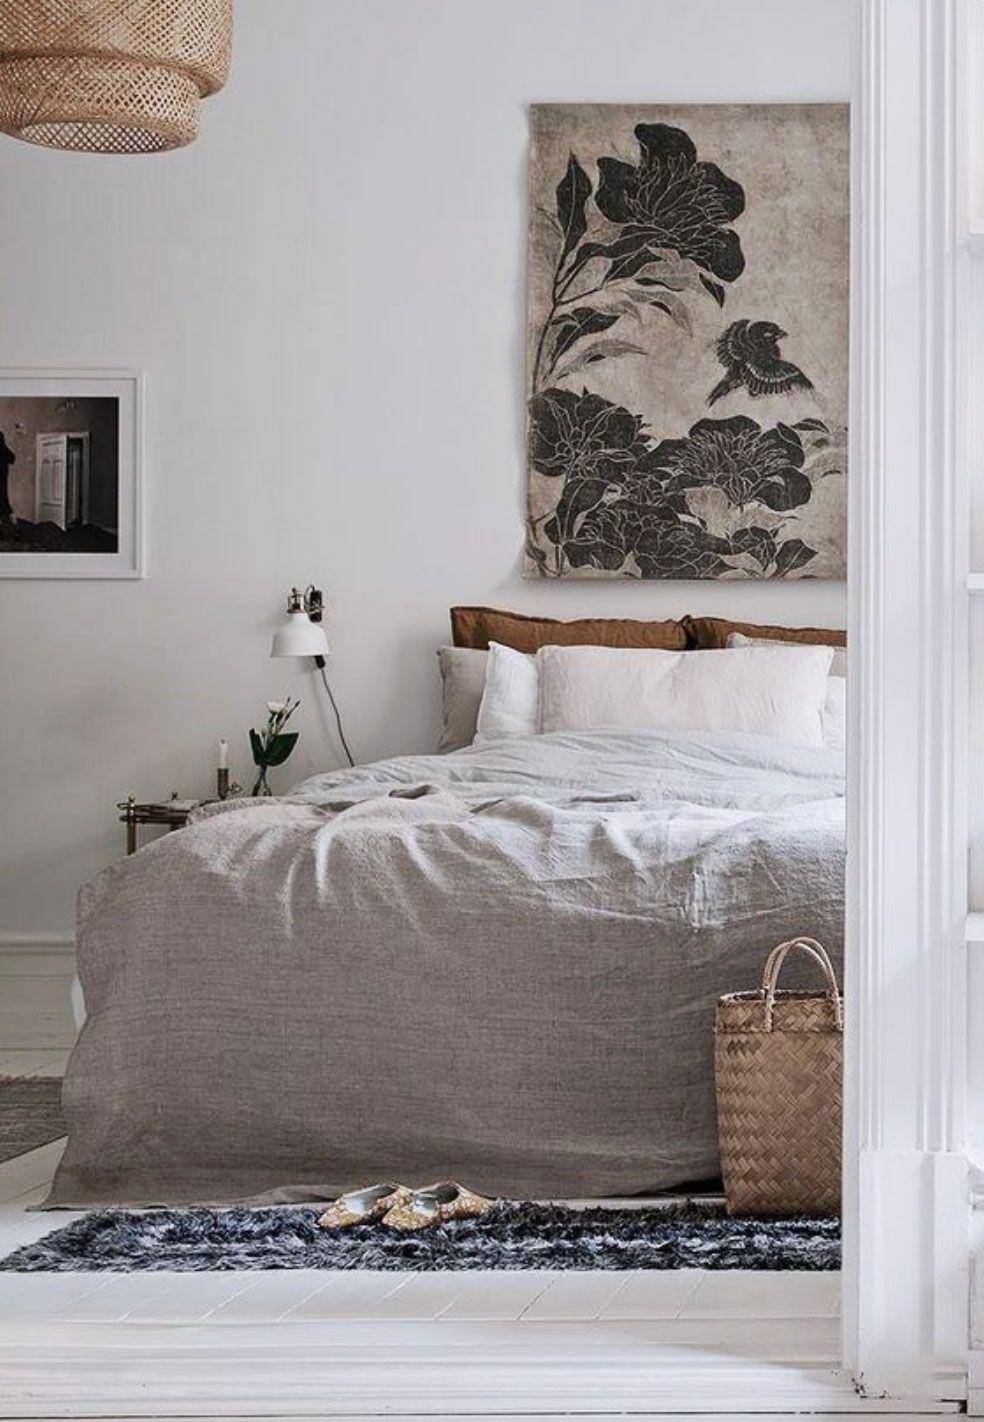 a fresh start to 2 0 1 9. | Zen bedroom decor, Home decor, Bedroom decor